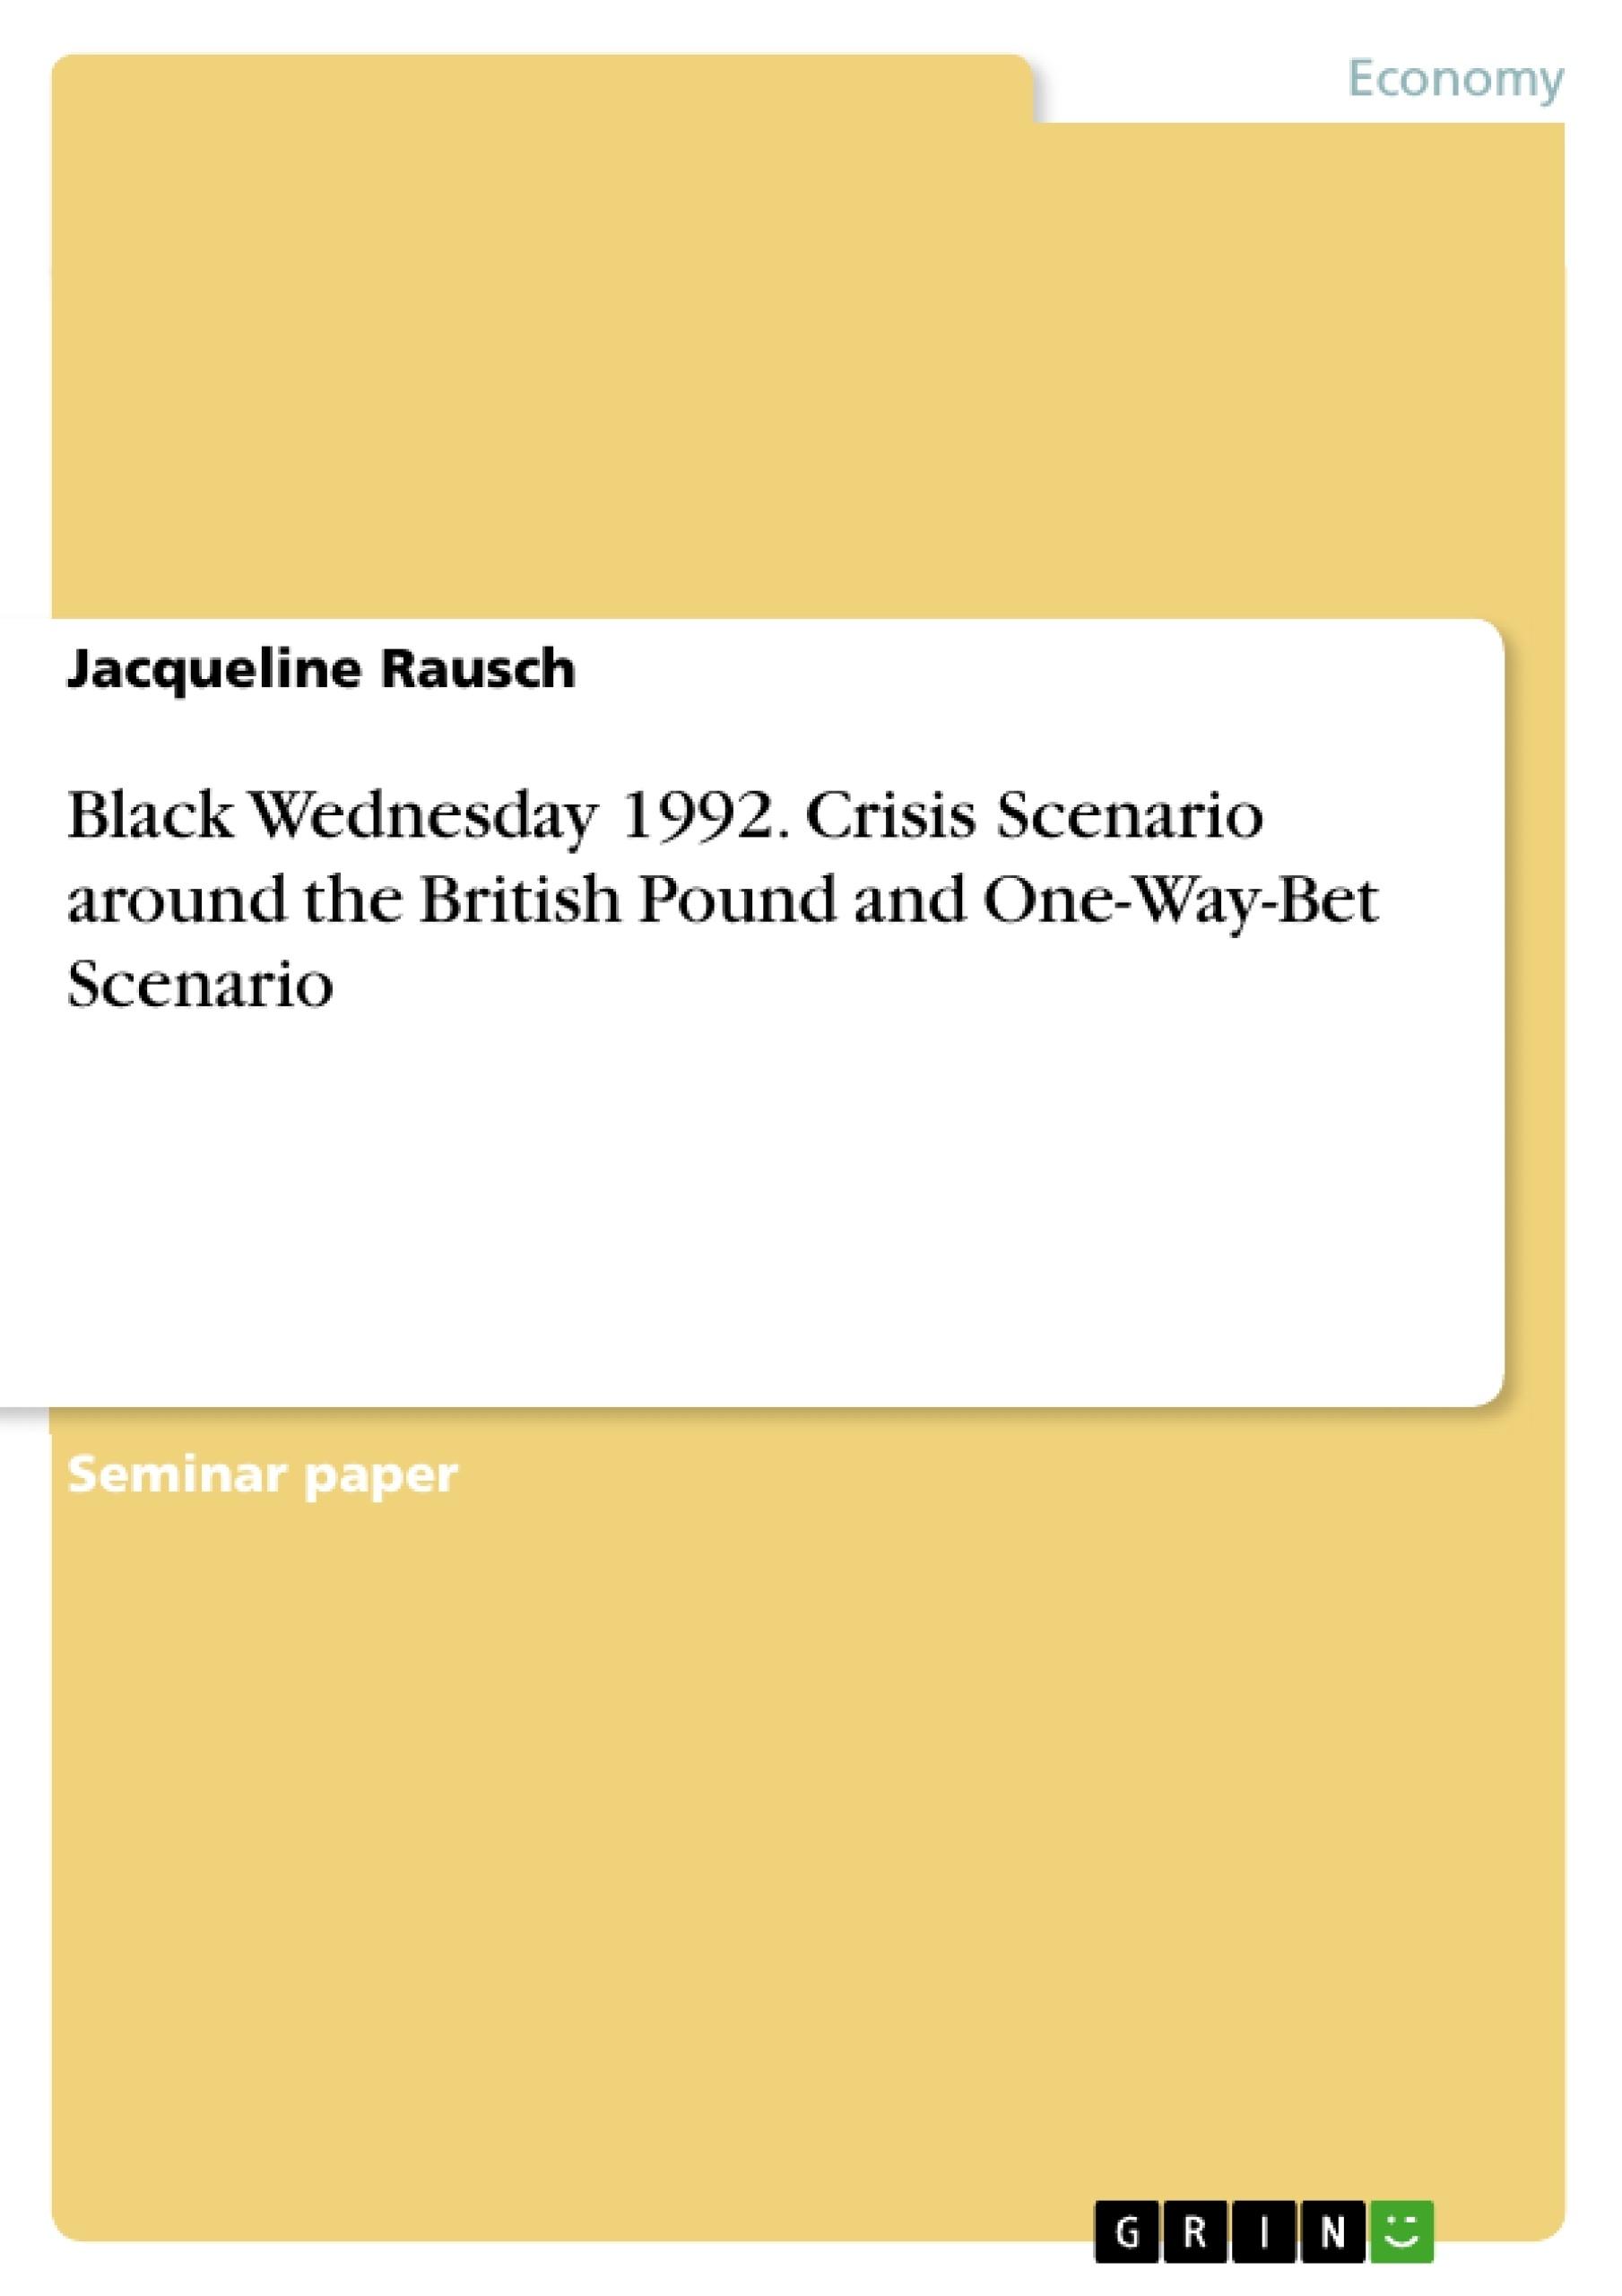 Title: Black Wednesday 1992. Crisis Scenario around the British Pound and One-Way-Bet Scenario